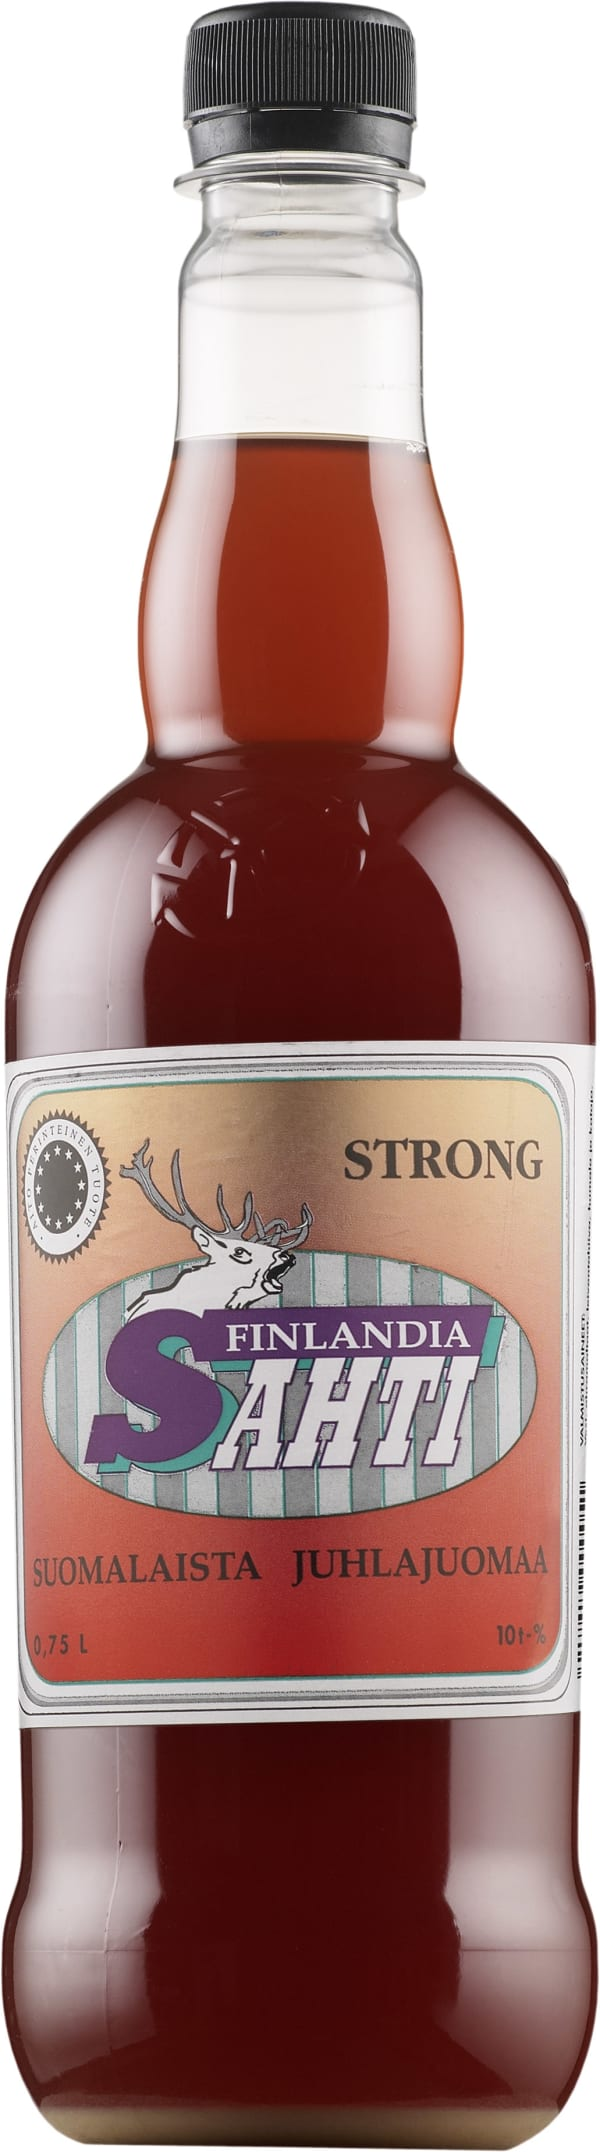 Finlandia Sahti Strong  muovipullo